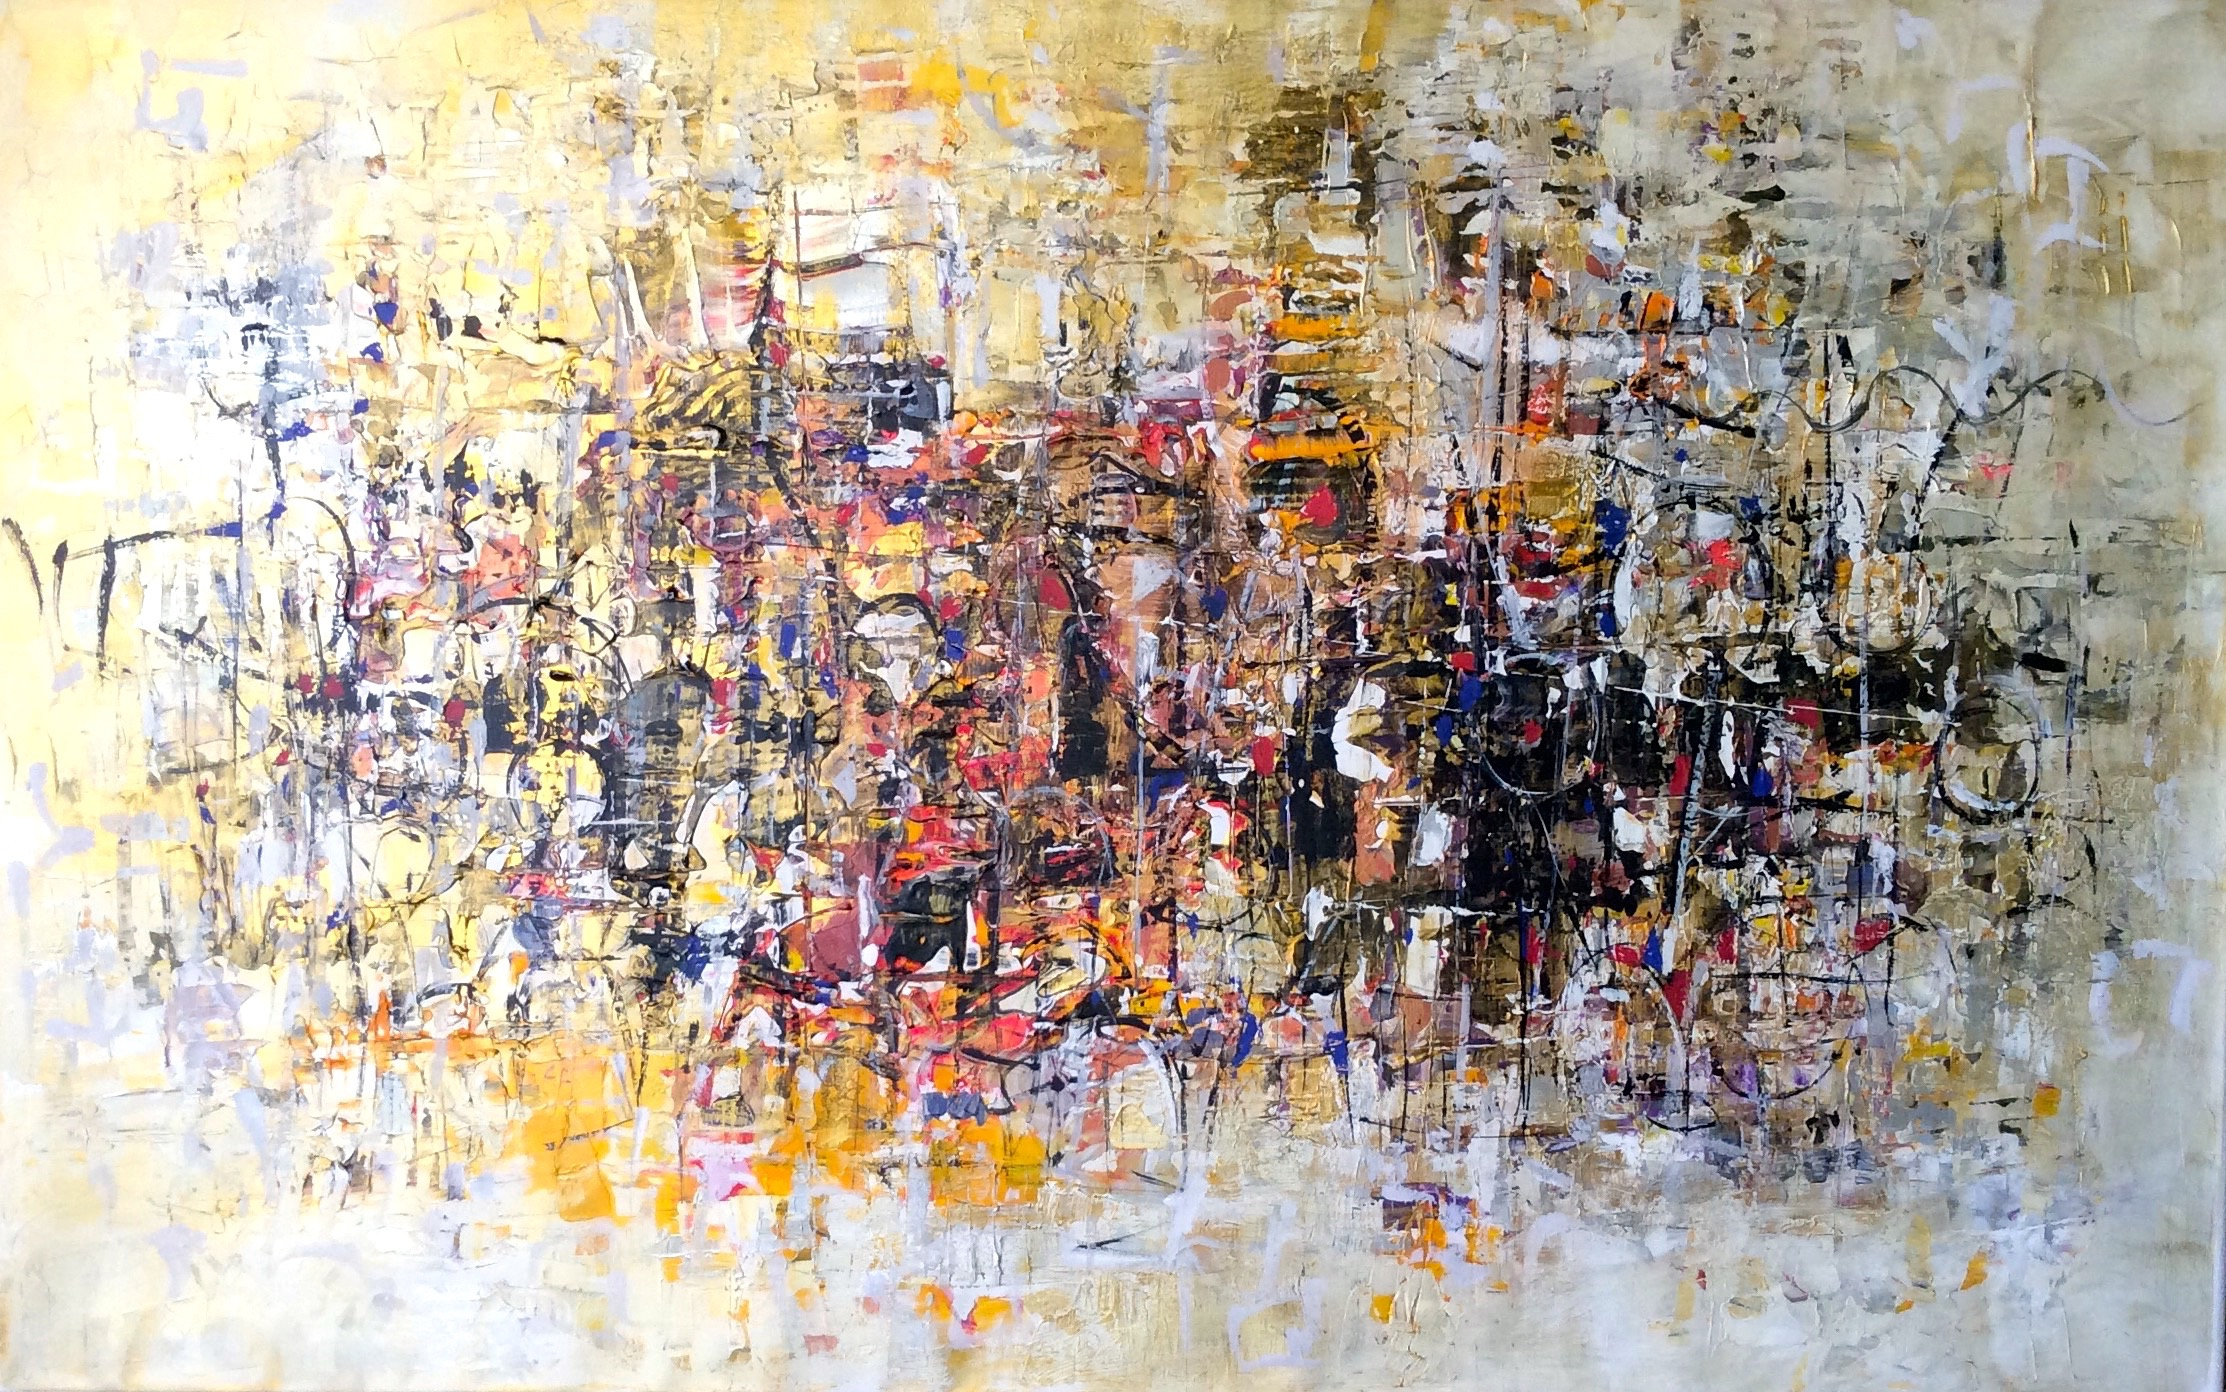 Painting of 4 Seasons by Paul Ygartua